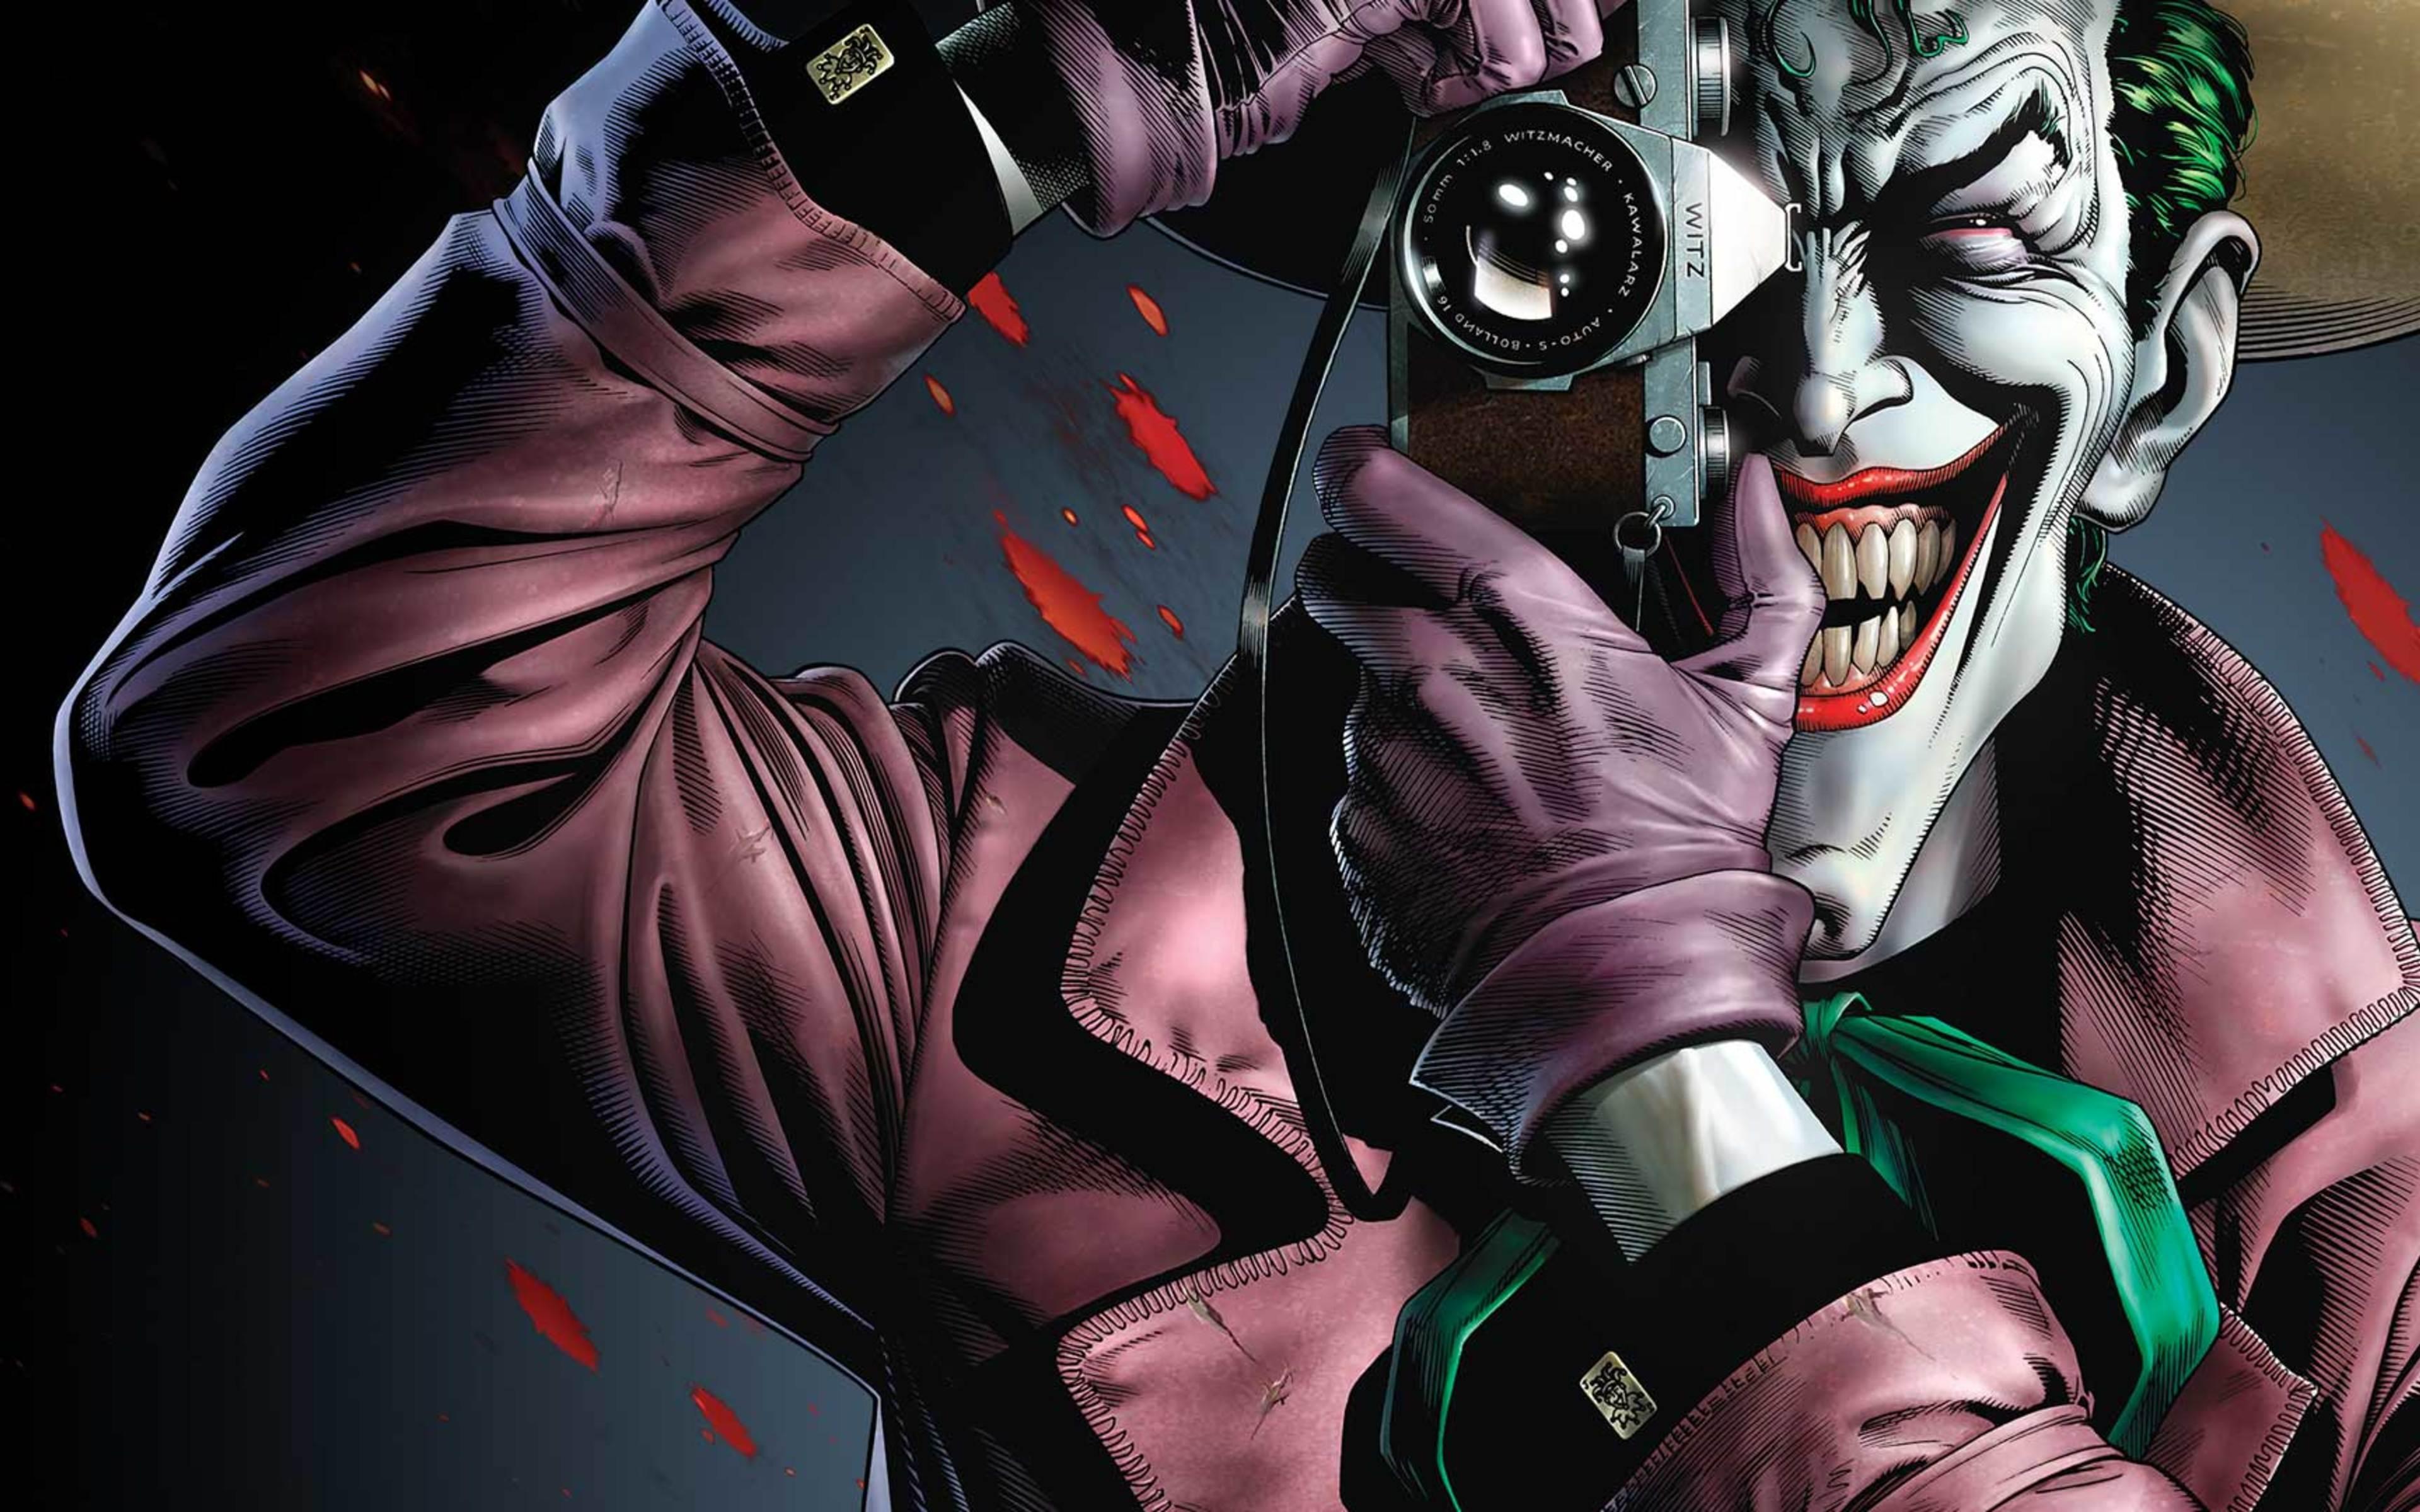 Fondos de pantalla Batman: la broma asesina